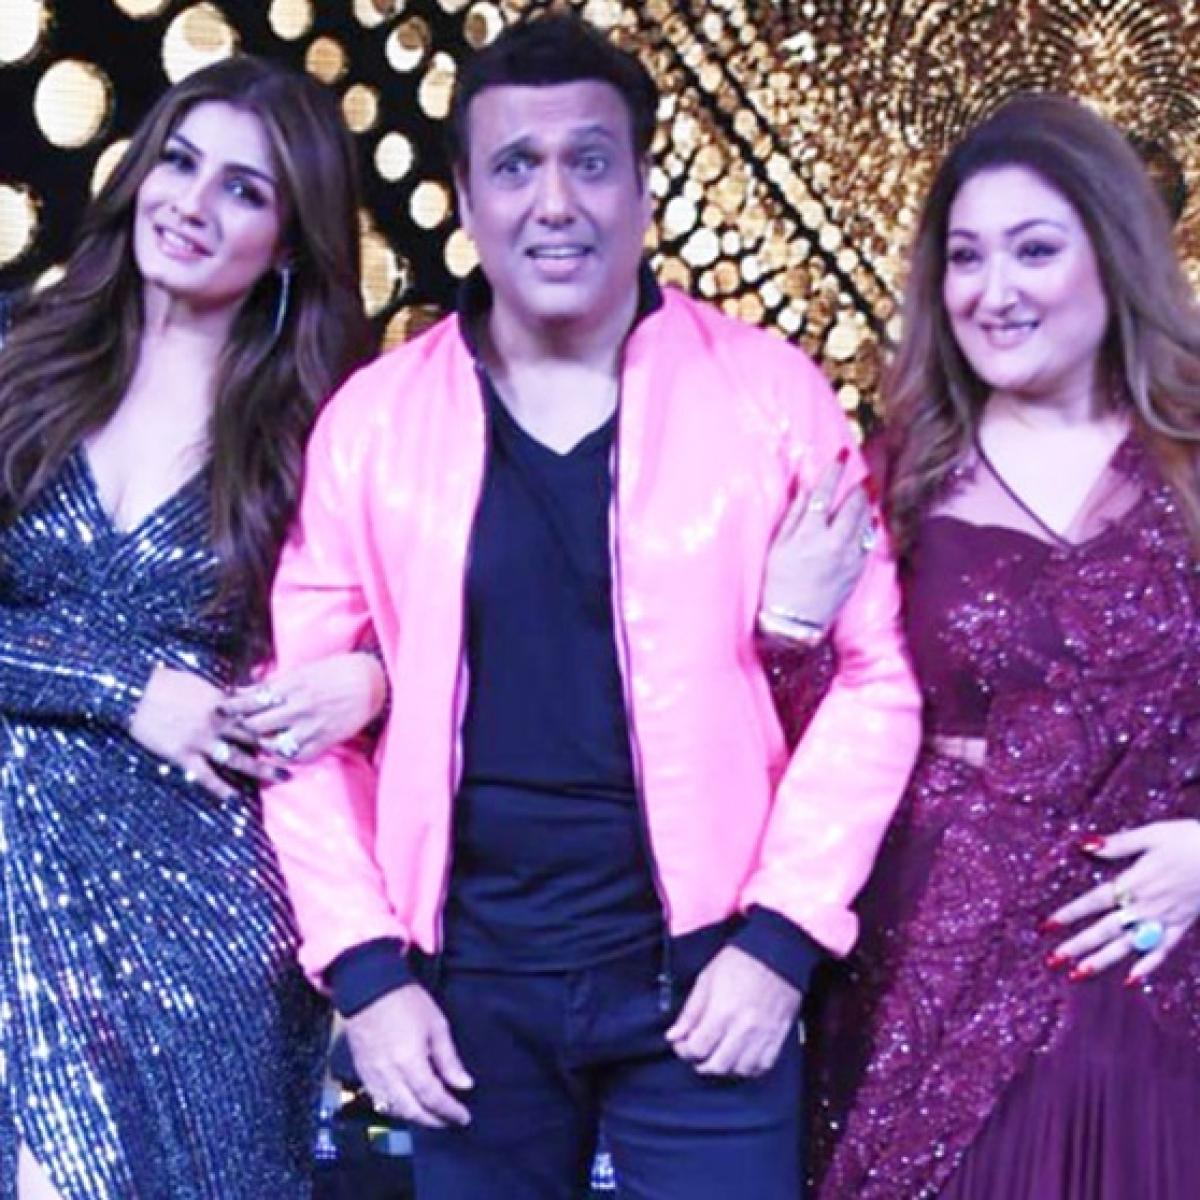 Govinda, Raveena Tandon, and Mohnish Bahl have 'Dulhe Raja' reunion on Nach Baliye 9